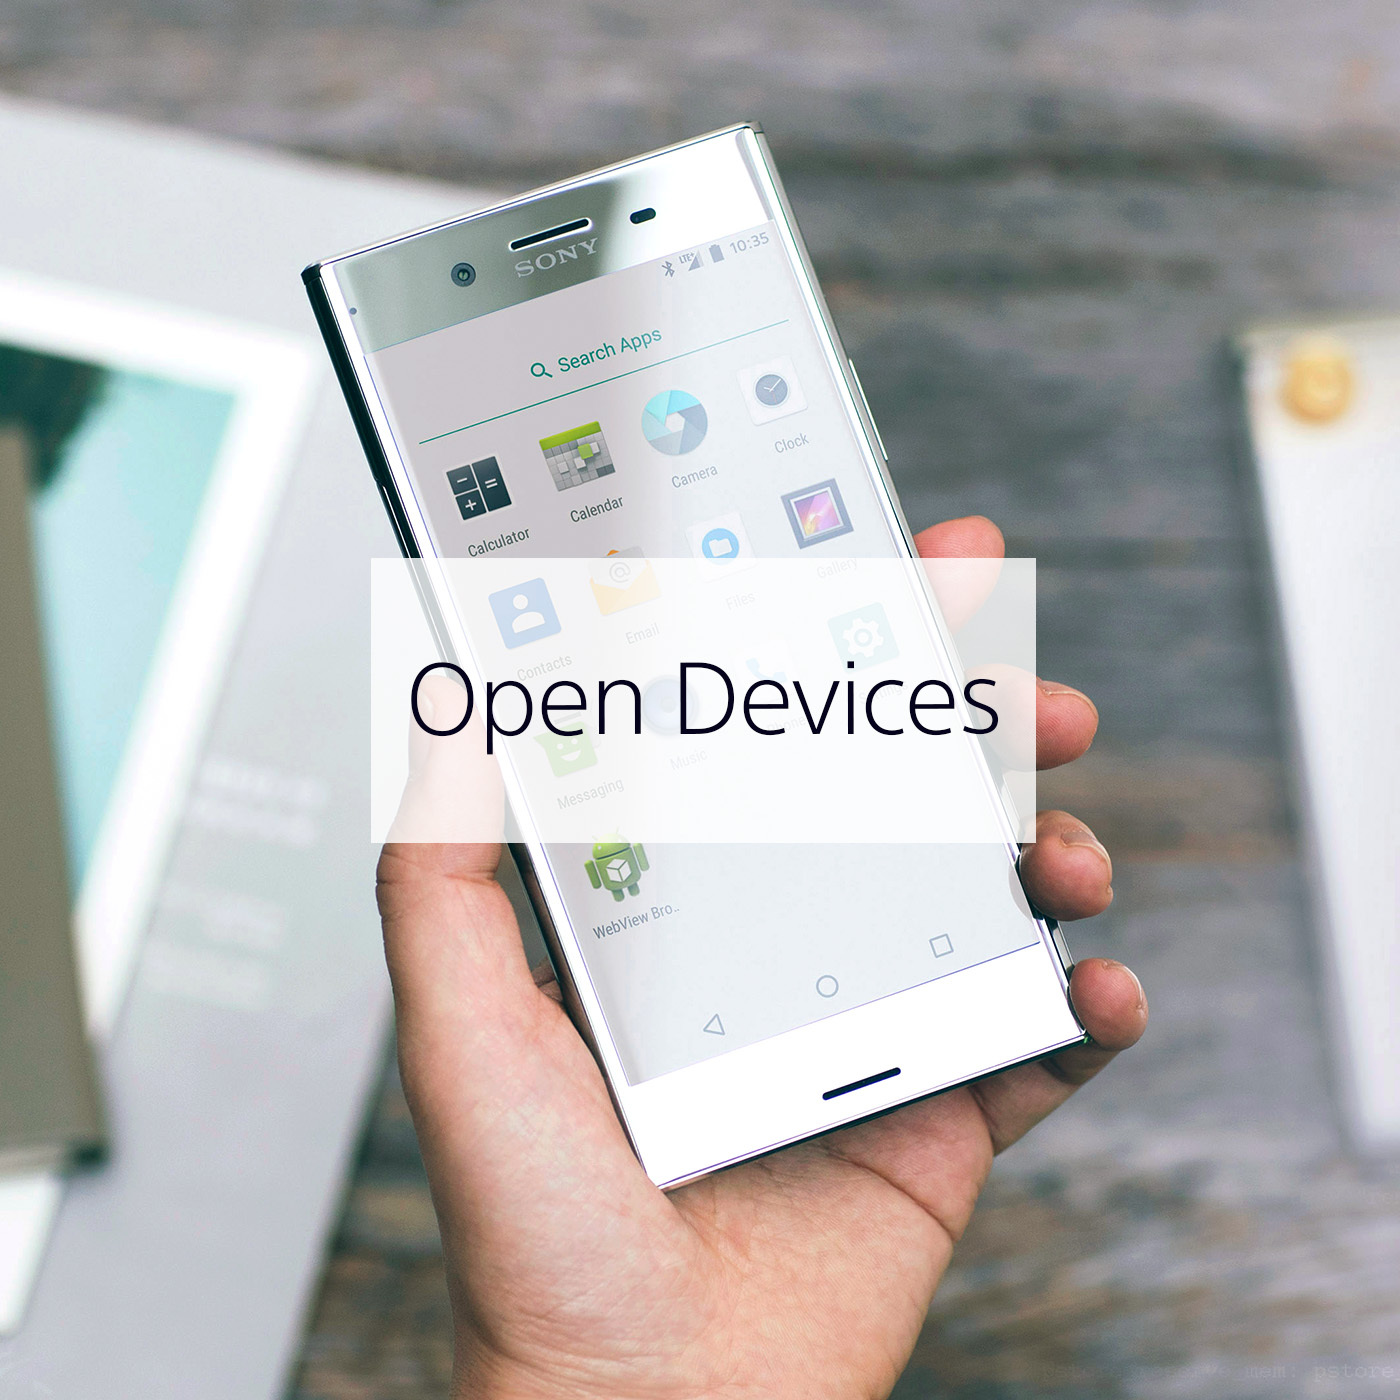 Open Device